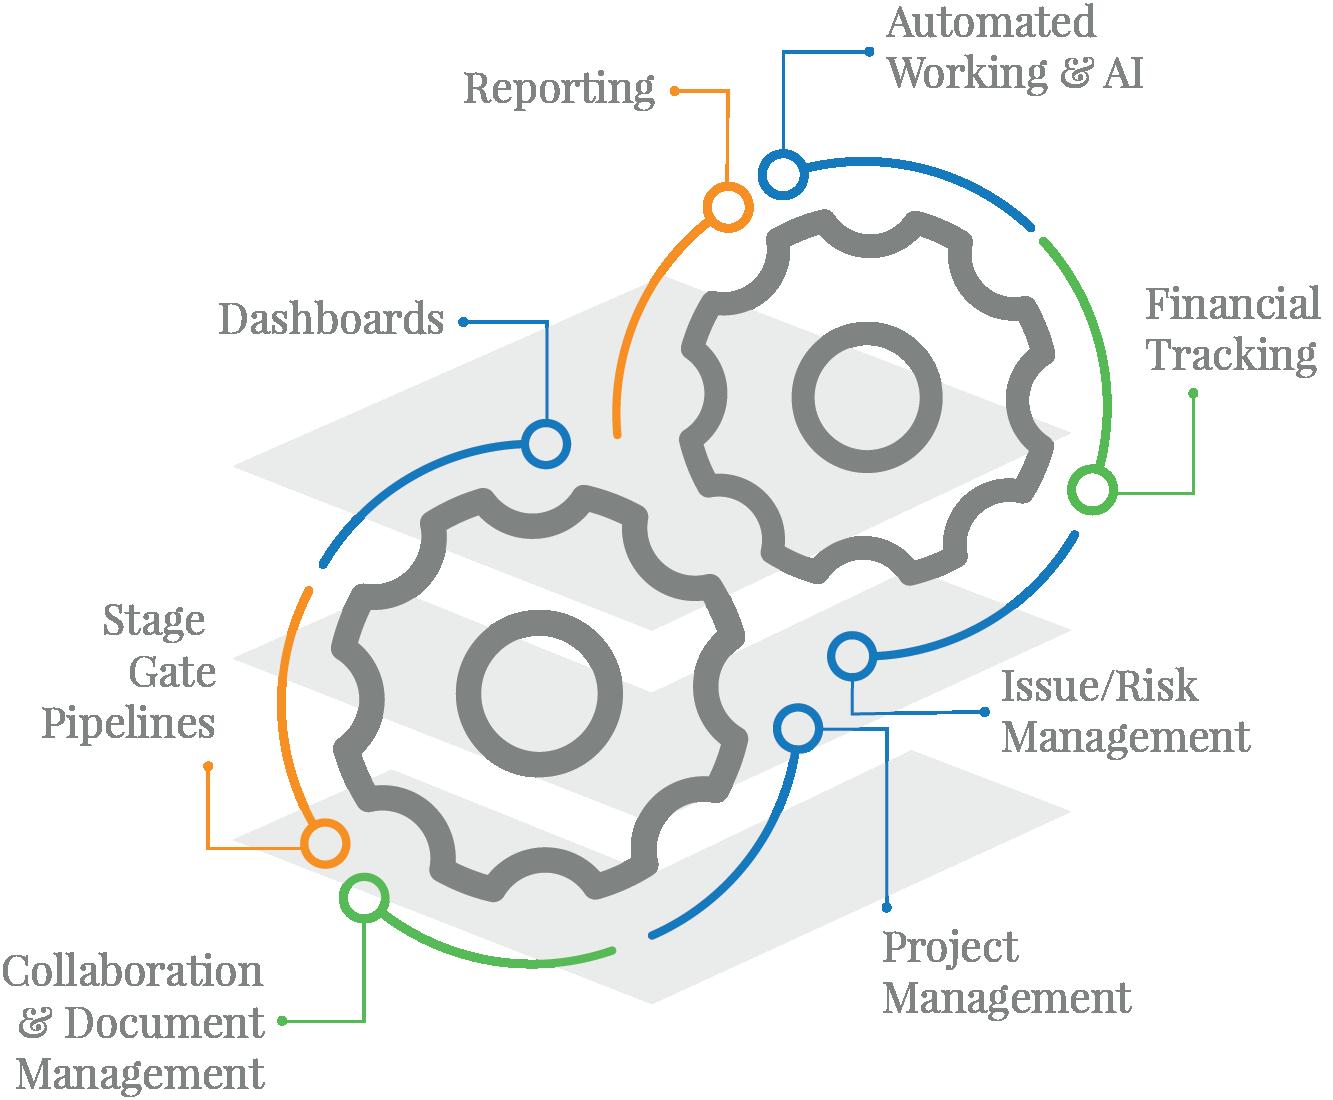 Technology Diagram